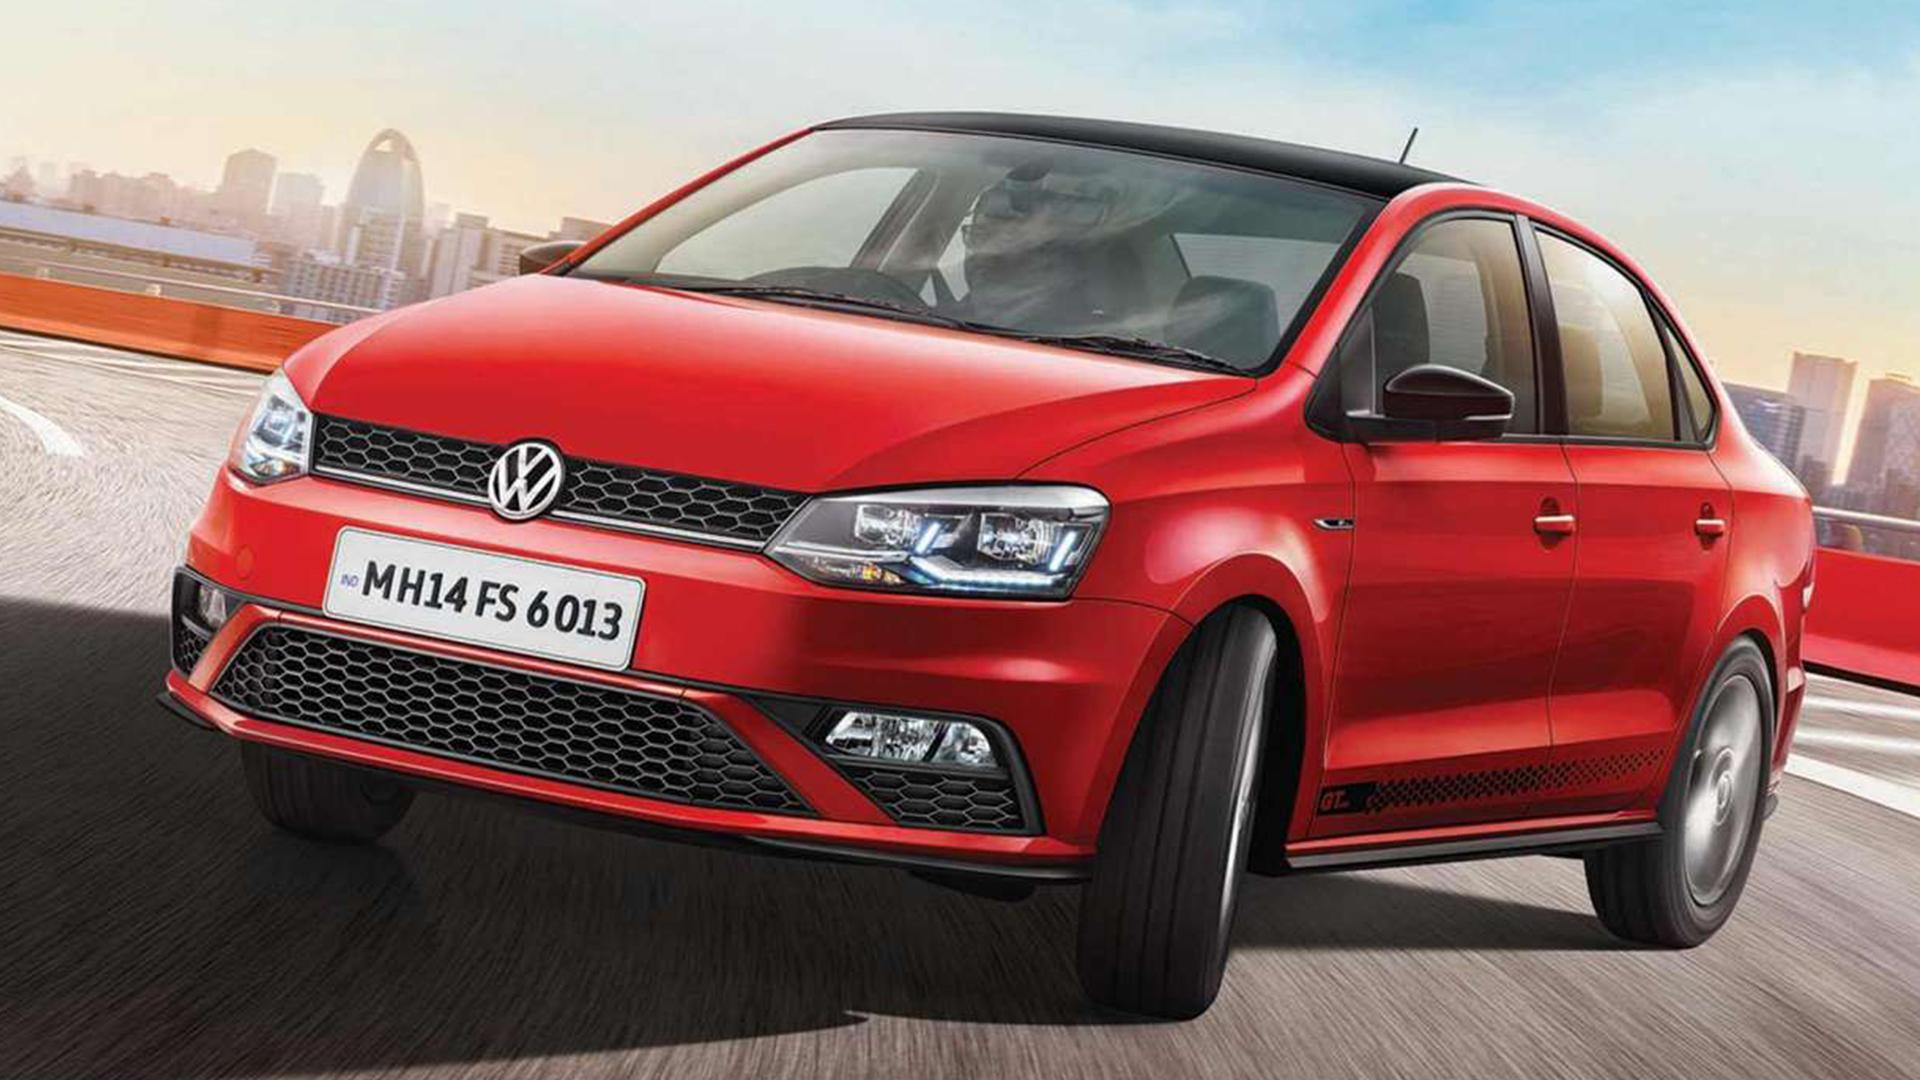 Volkswagen Vento 2019 1.5 TDI Highline Plus AT